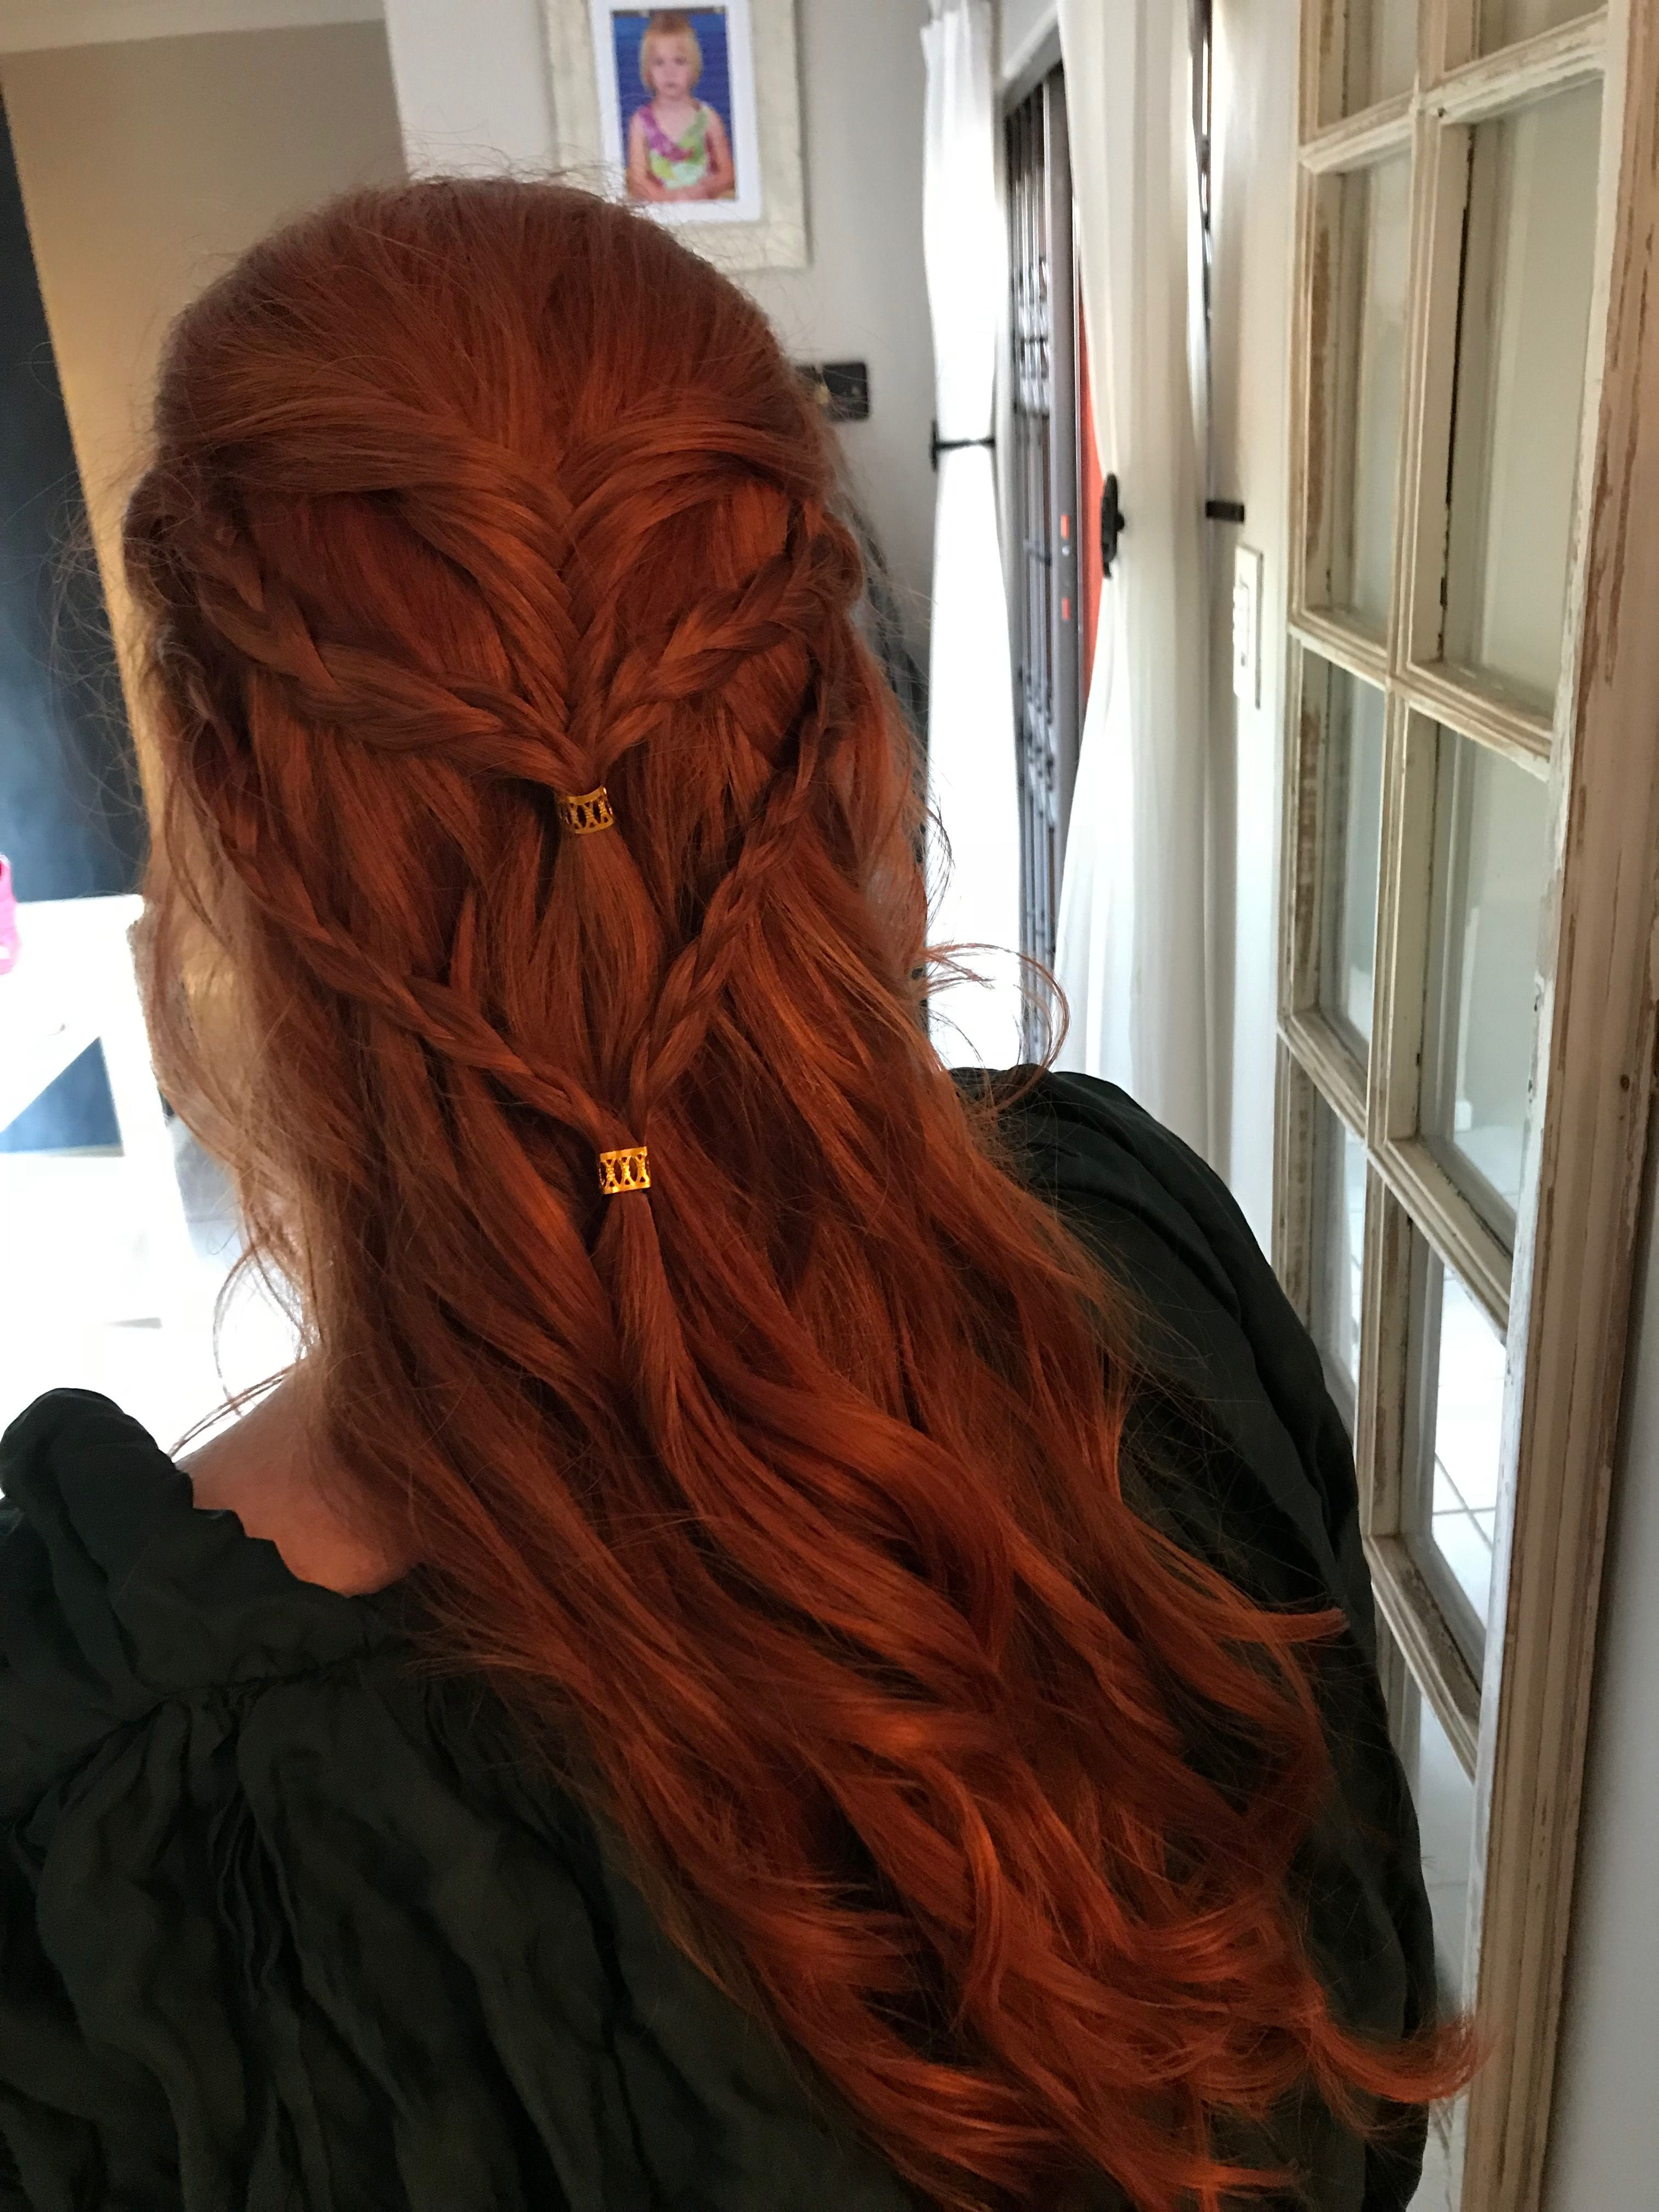 Pin By Felehi On Readheads In 2020 Redheads Sophie Turner Redhead